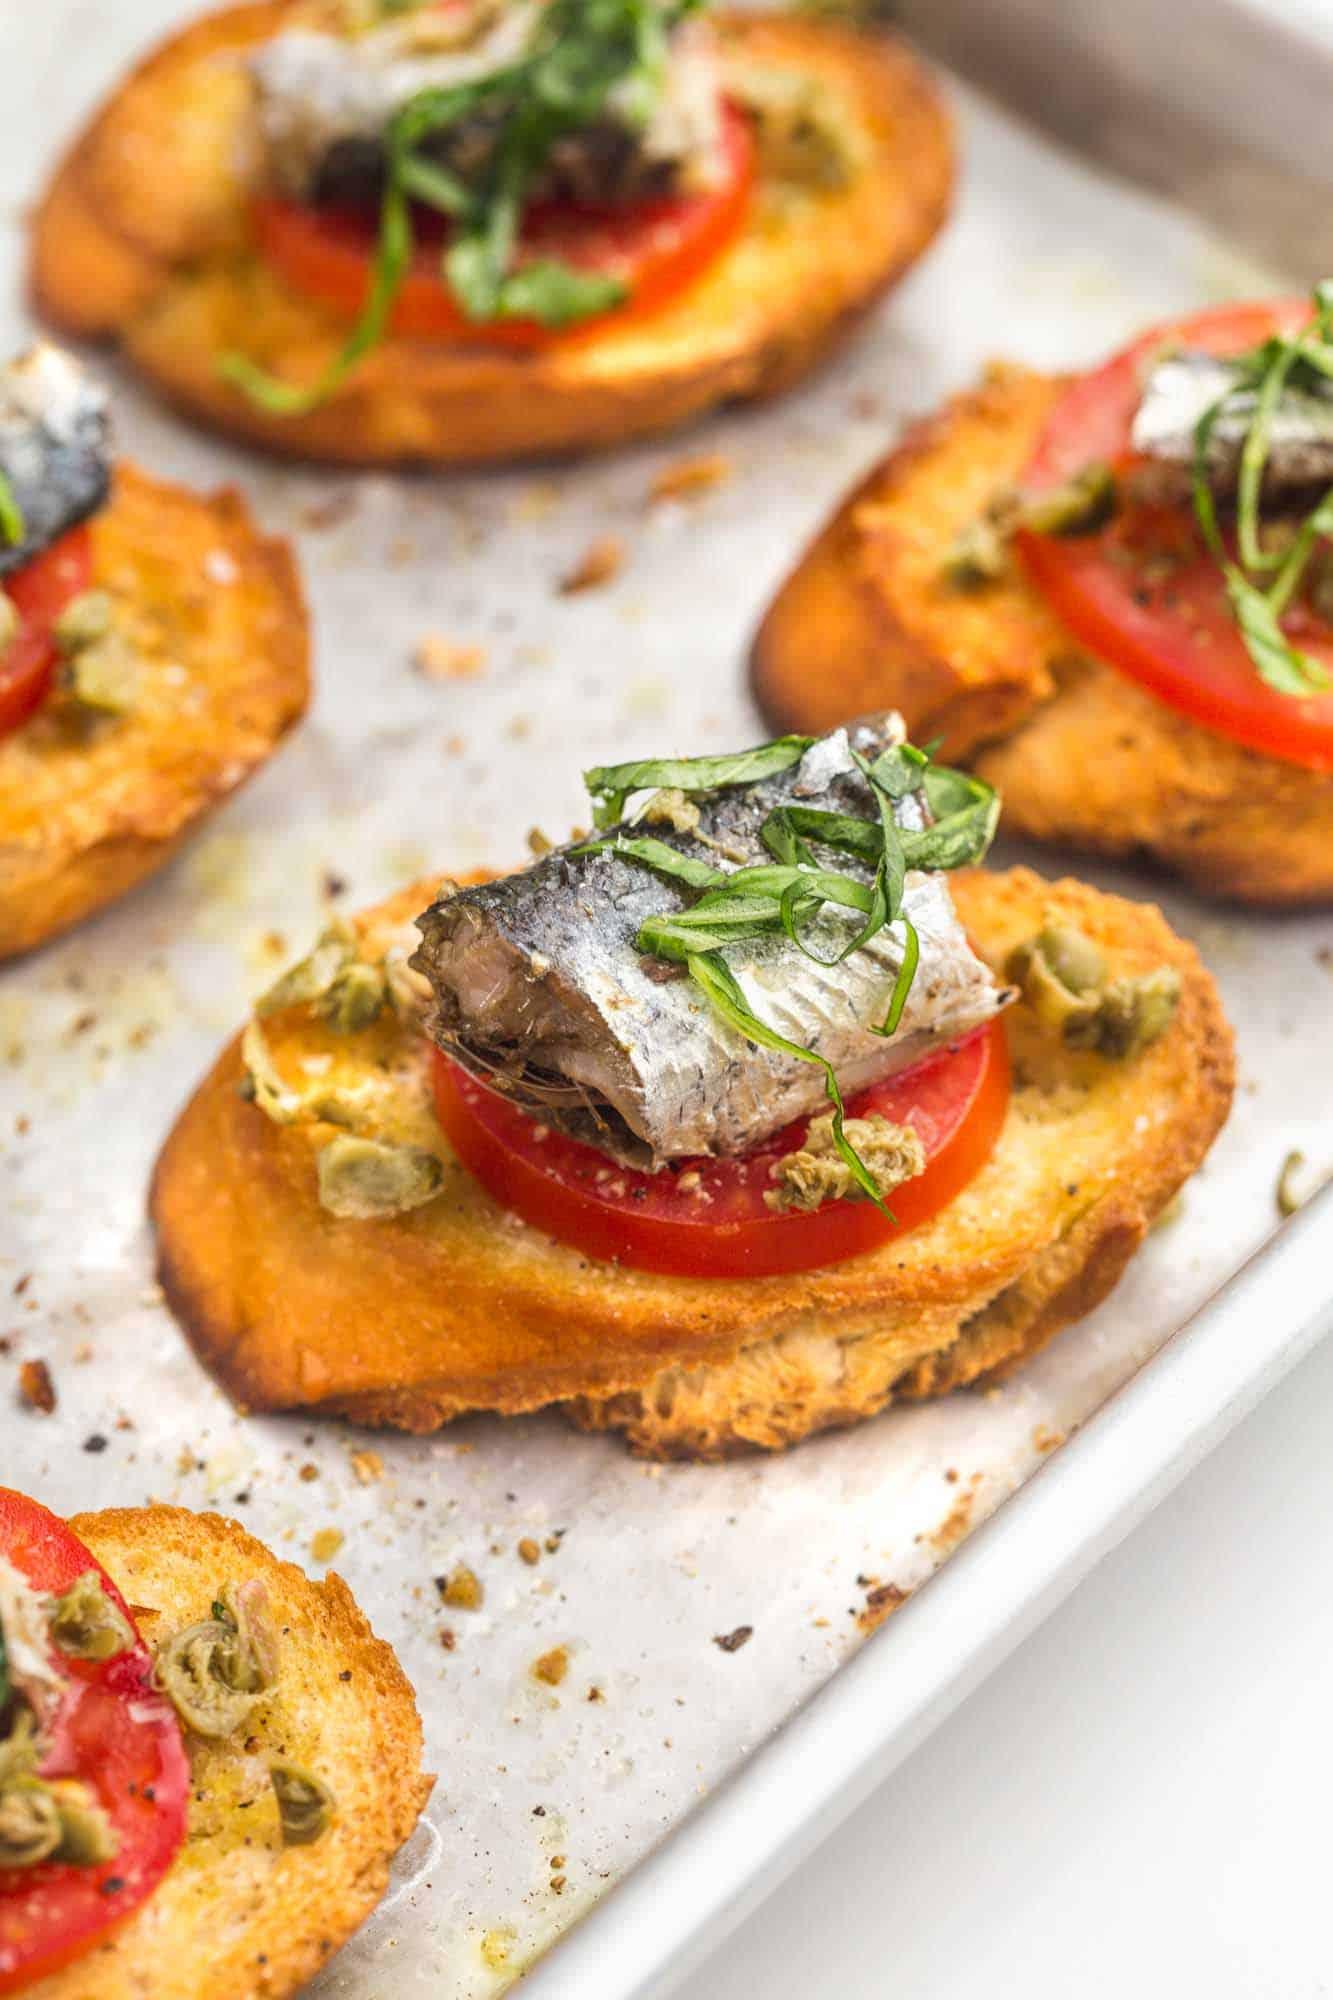 Sardine toasts on a sheet pan